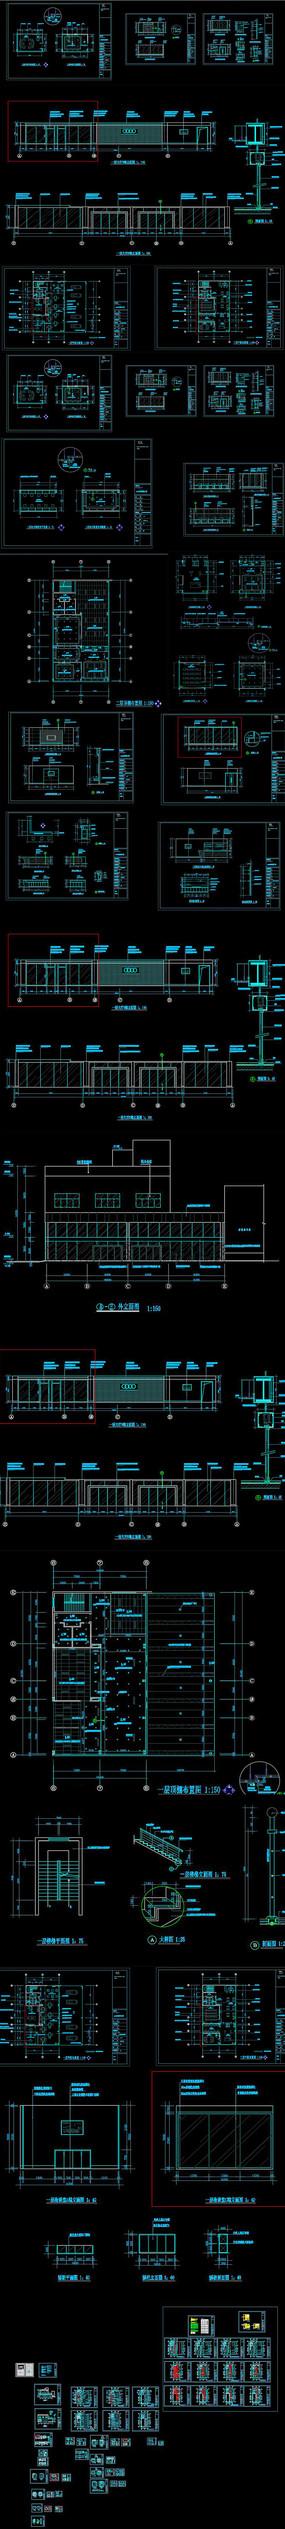 4S店室内装饰CAD施工图